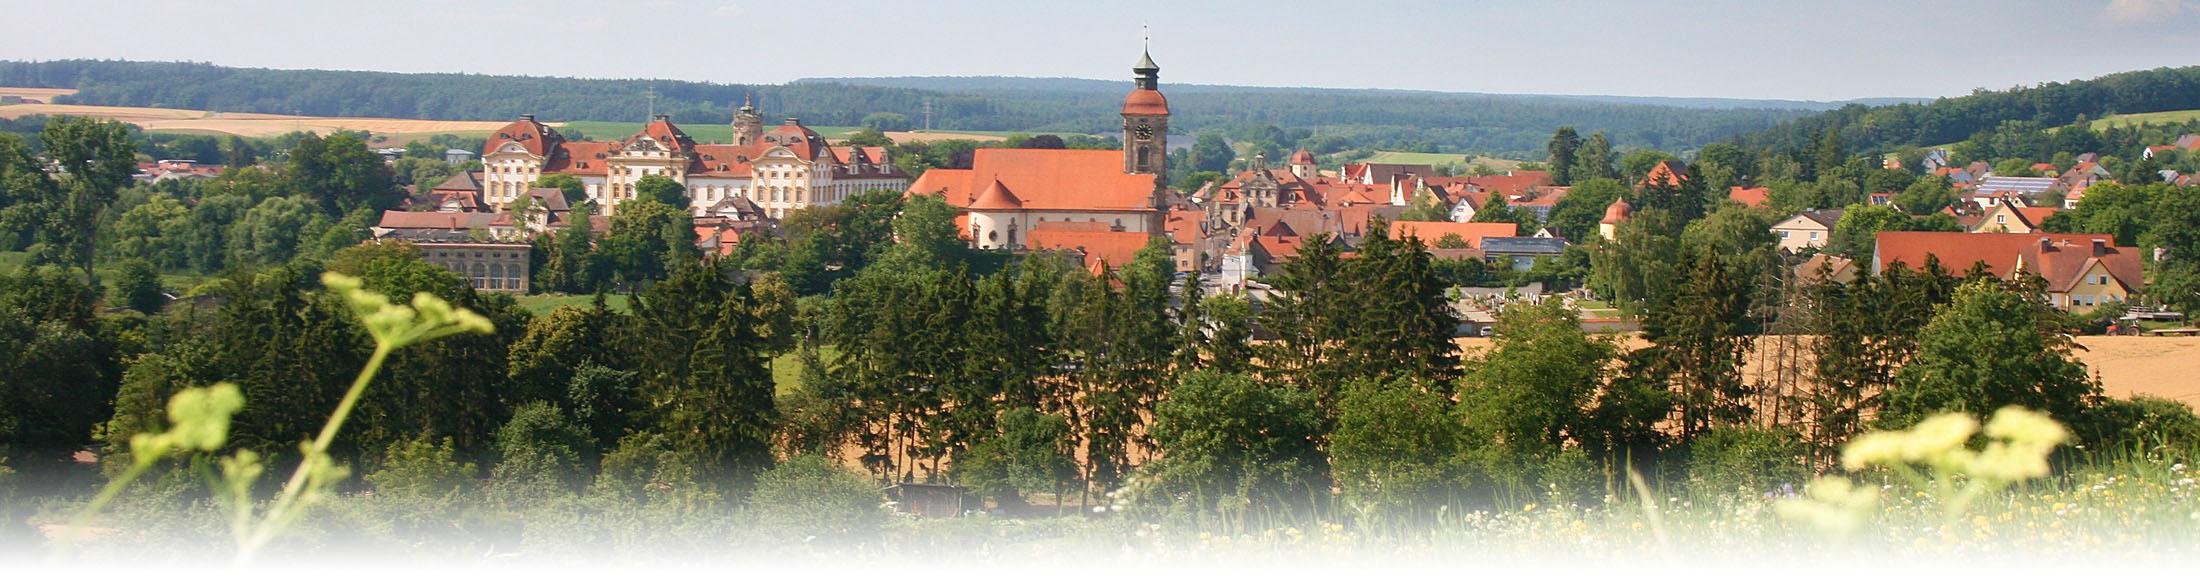 Panorama von Ellingen